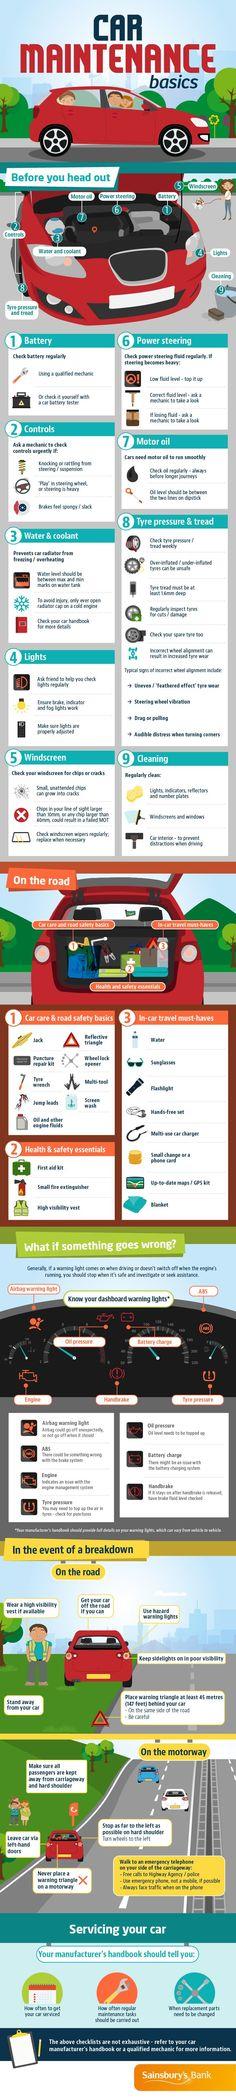 Car Maintenance Schema - Tips - #automotive #carmaitenance